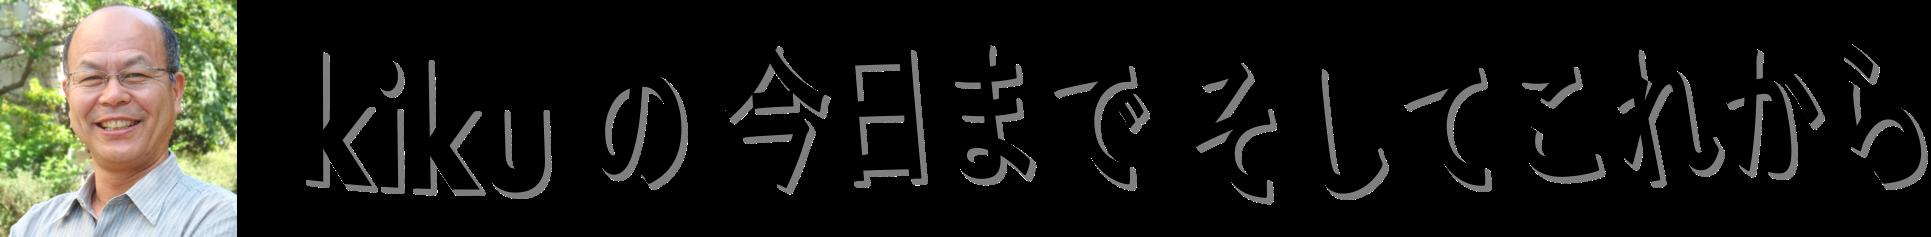 kikusawa's site